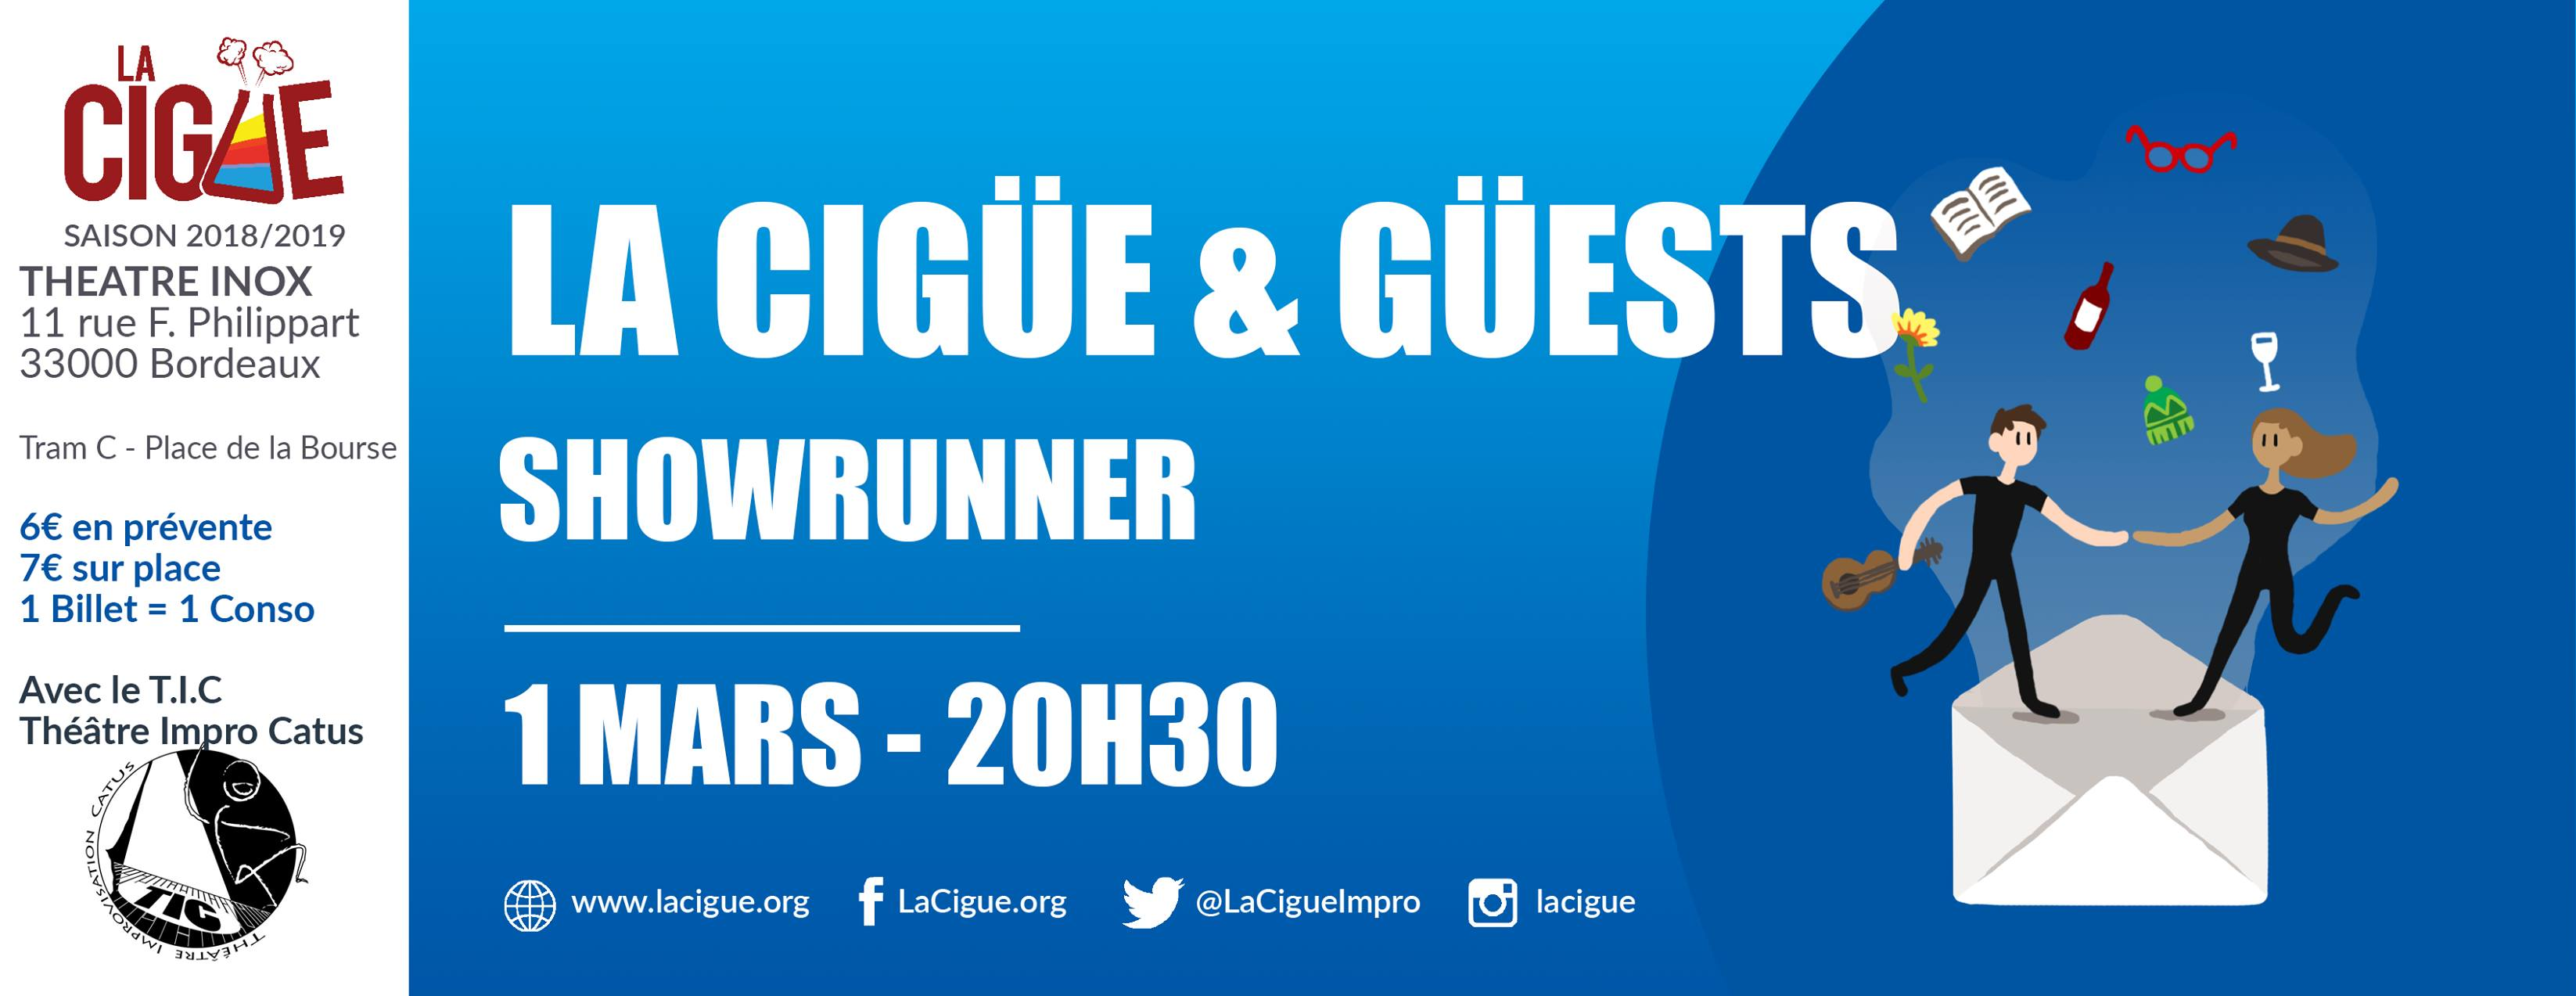 La Cigüe & Güests #2 – Showrunner avec Le TICS (Catus)